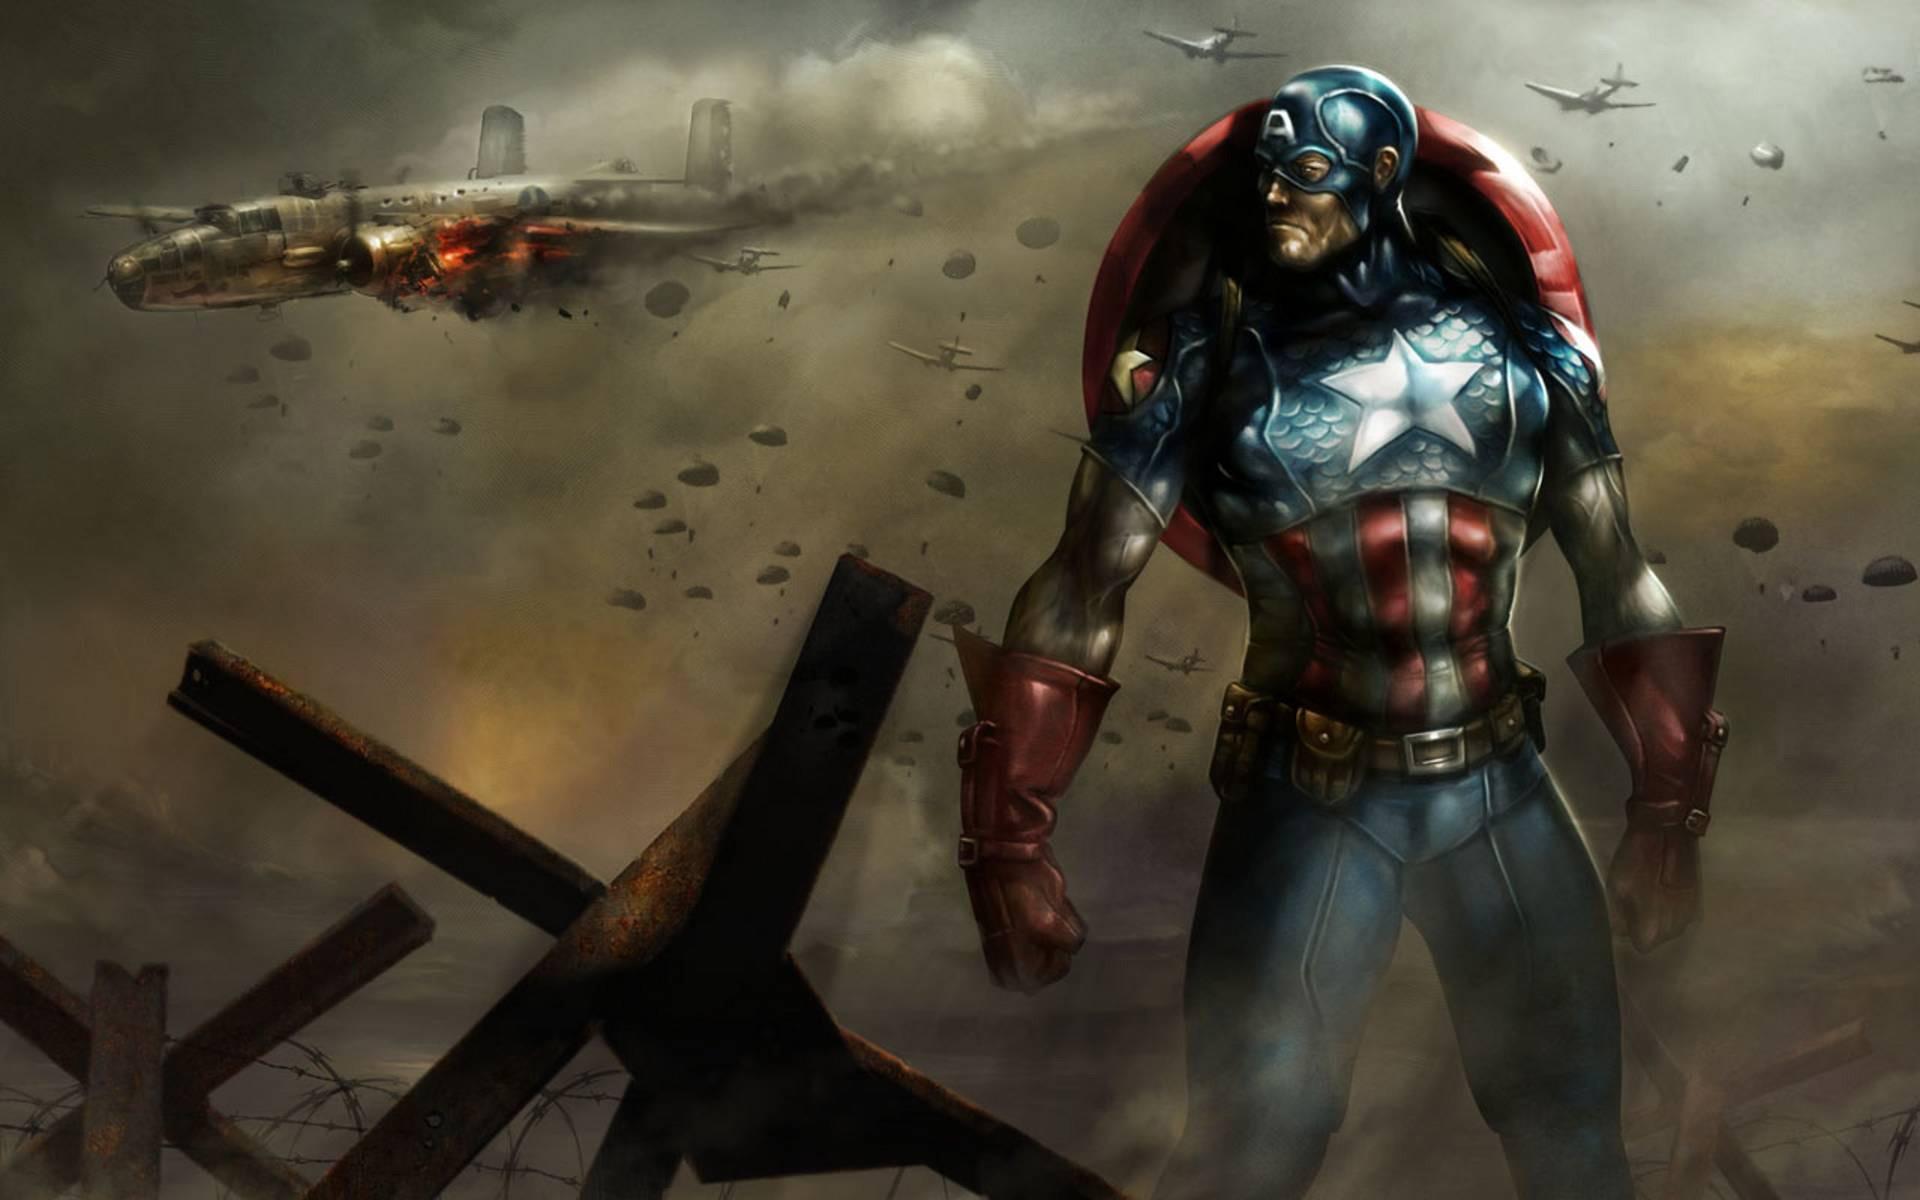 Captain America Daily Dose of Comics 1920x1200